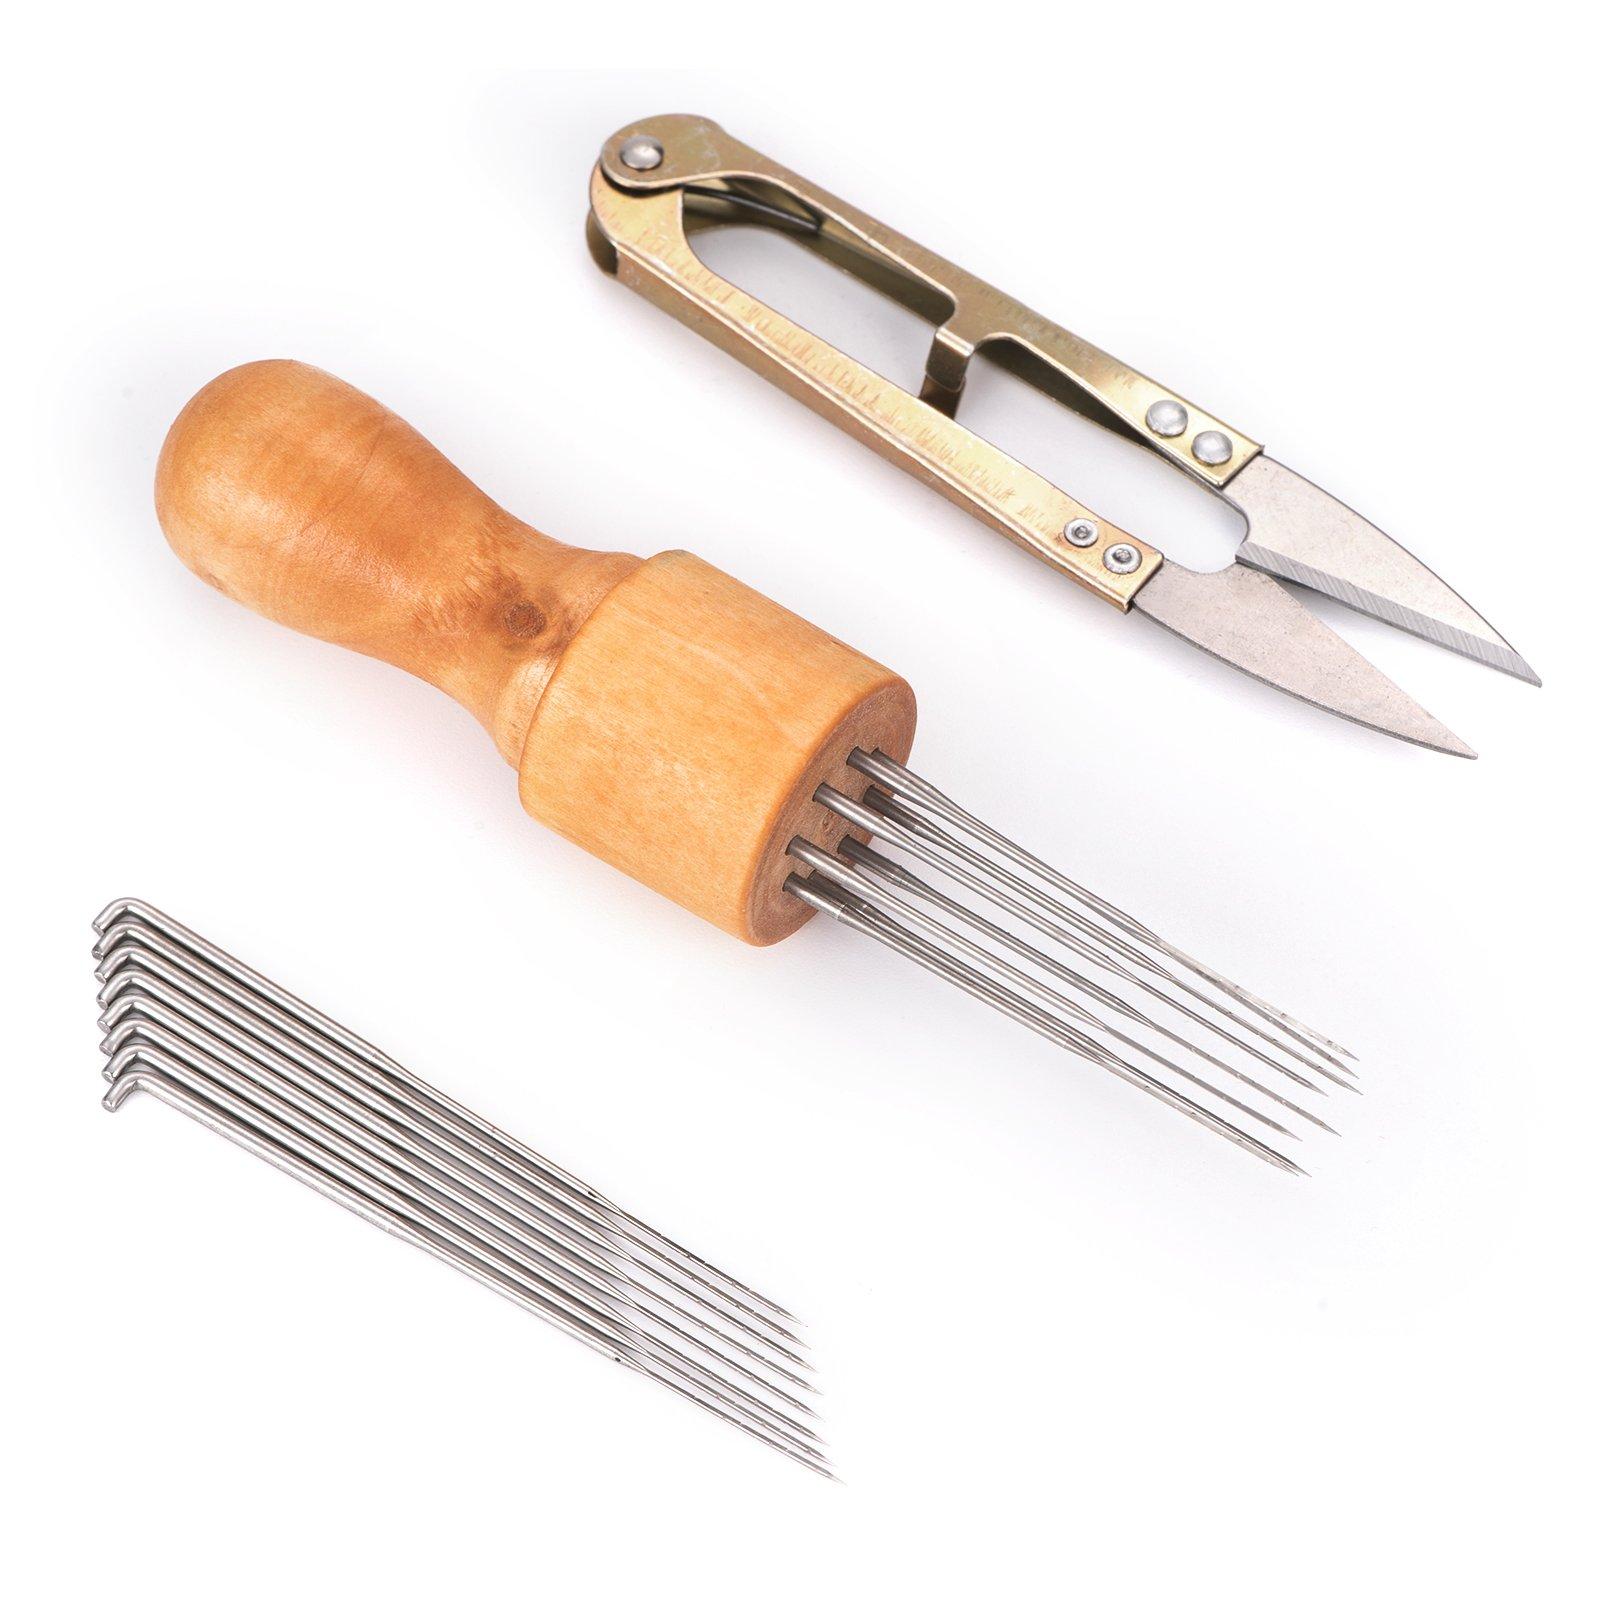 Kecuco Needle Felting Kits Needle Felting Supplies, Wool Felting Needles Tool Including 8 Needles with Solid Wooden Handle, 8 pcs Replacement Needles, 1 pcs Scissors(Tool Needles Scissors)